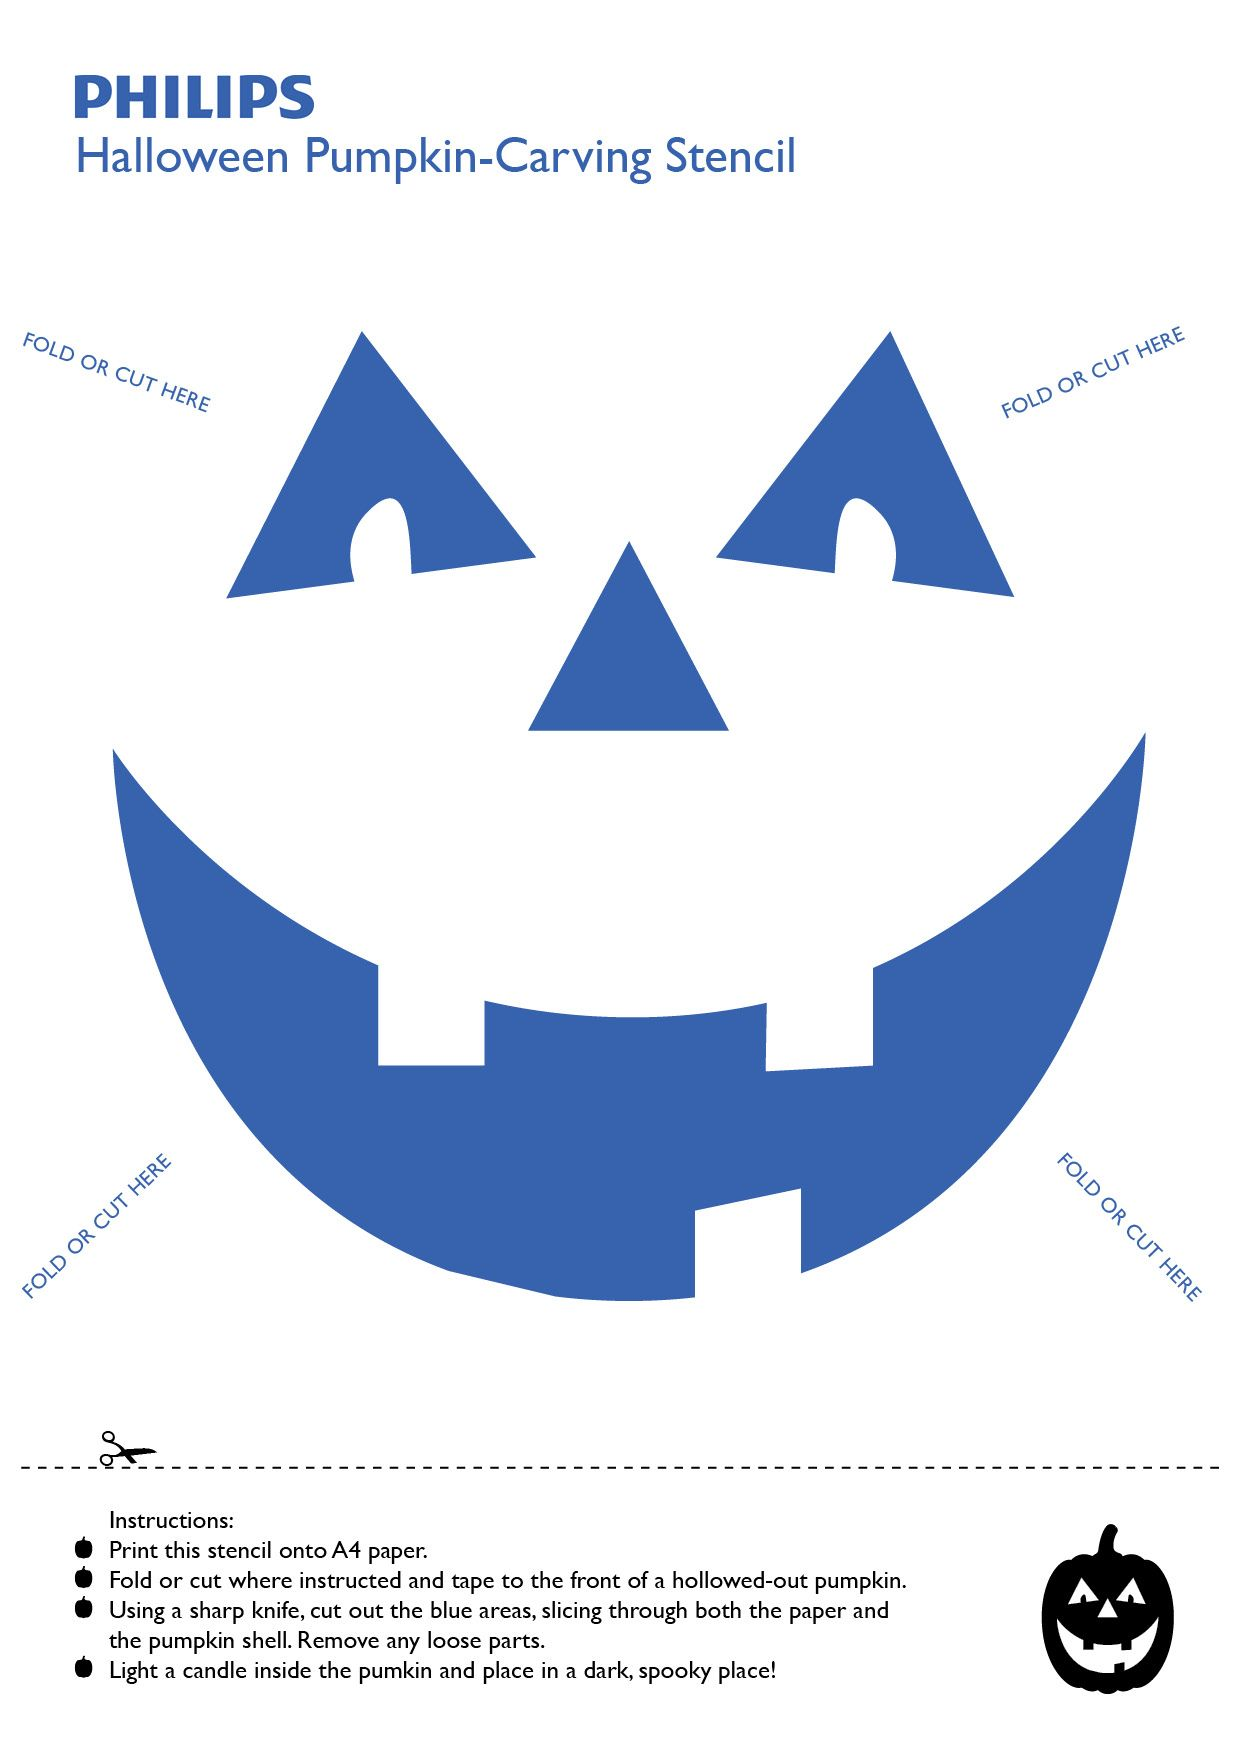 Philips Halloween Pumpkin Carving Stencil